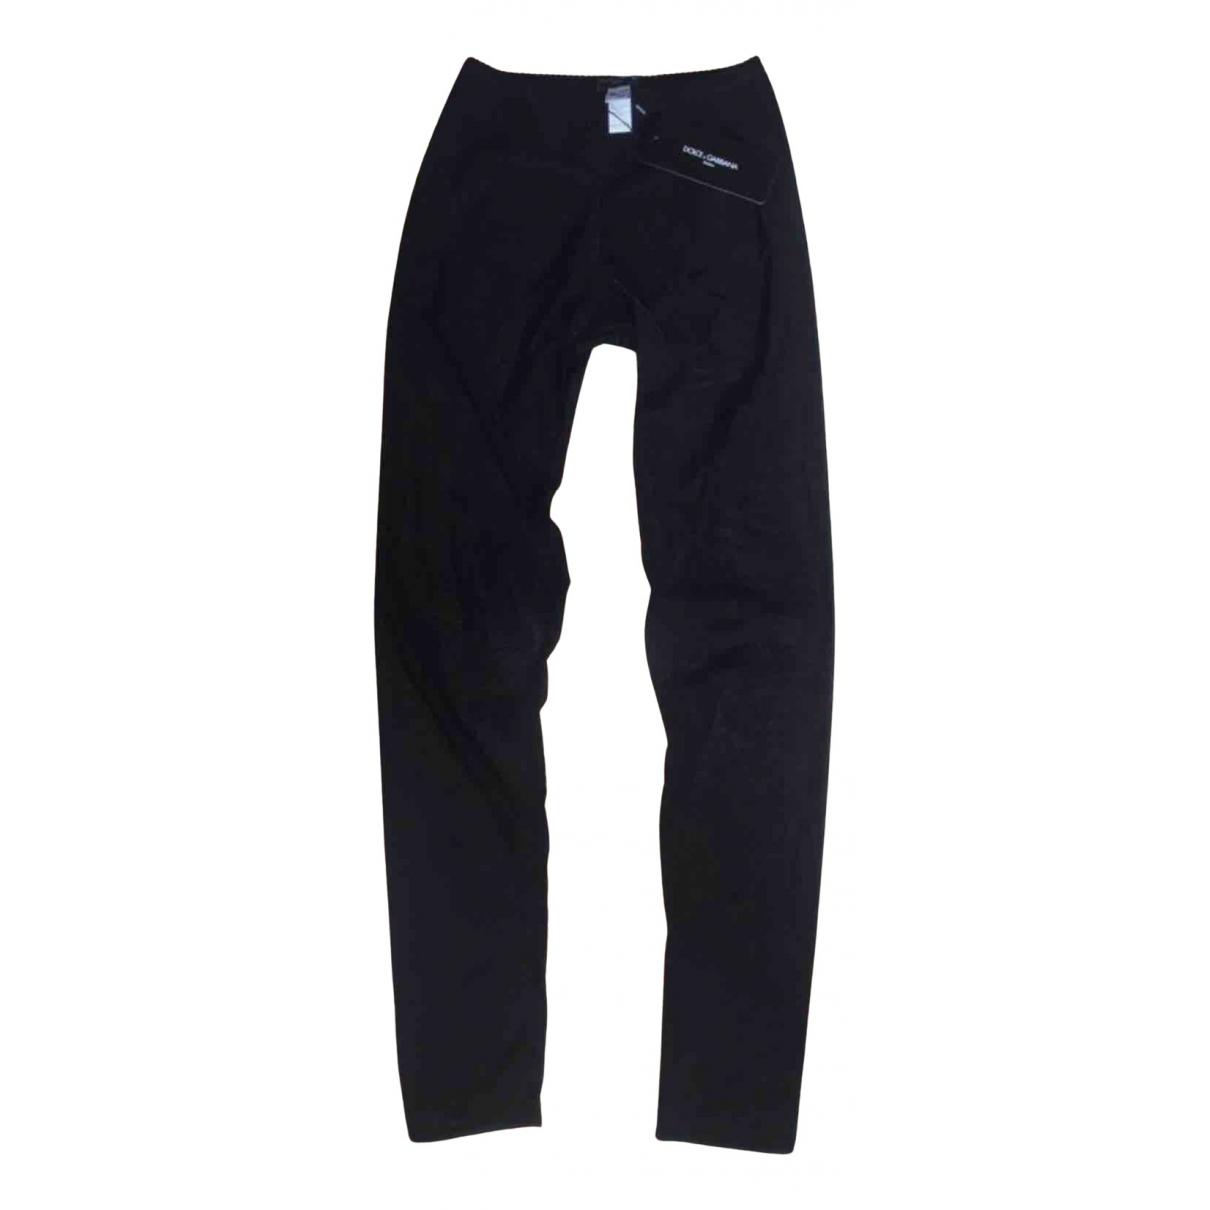 Dolce & Gabbana N Black Spandex Trousers for Women 34 FR